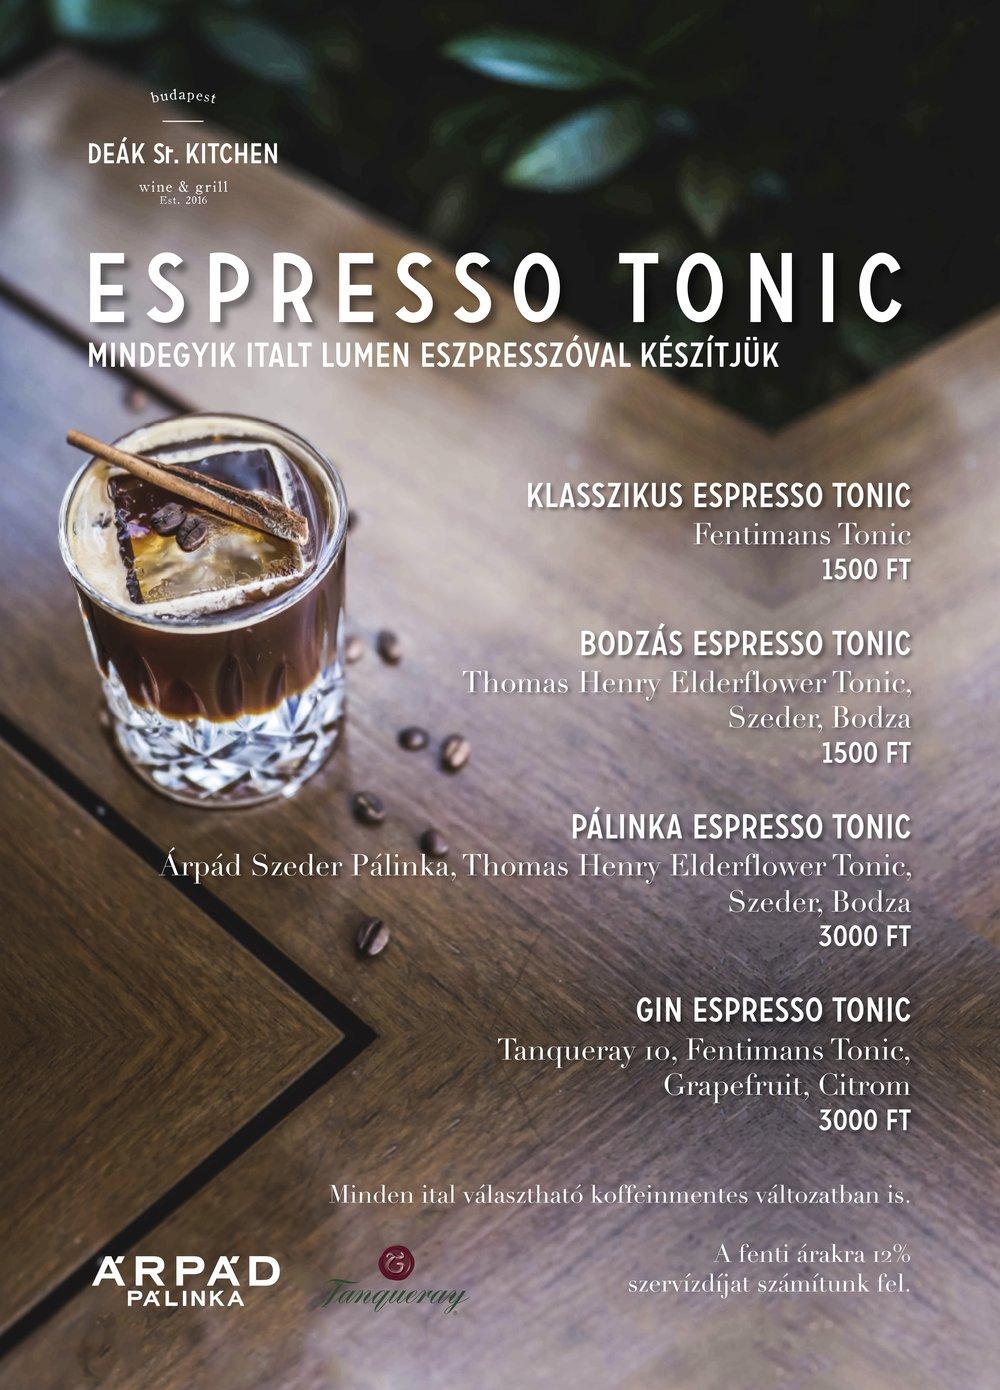 espressotonic.jpg